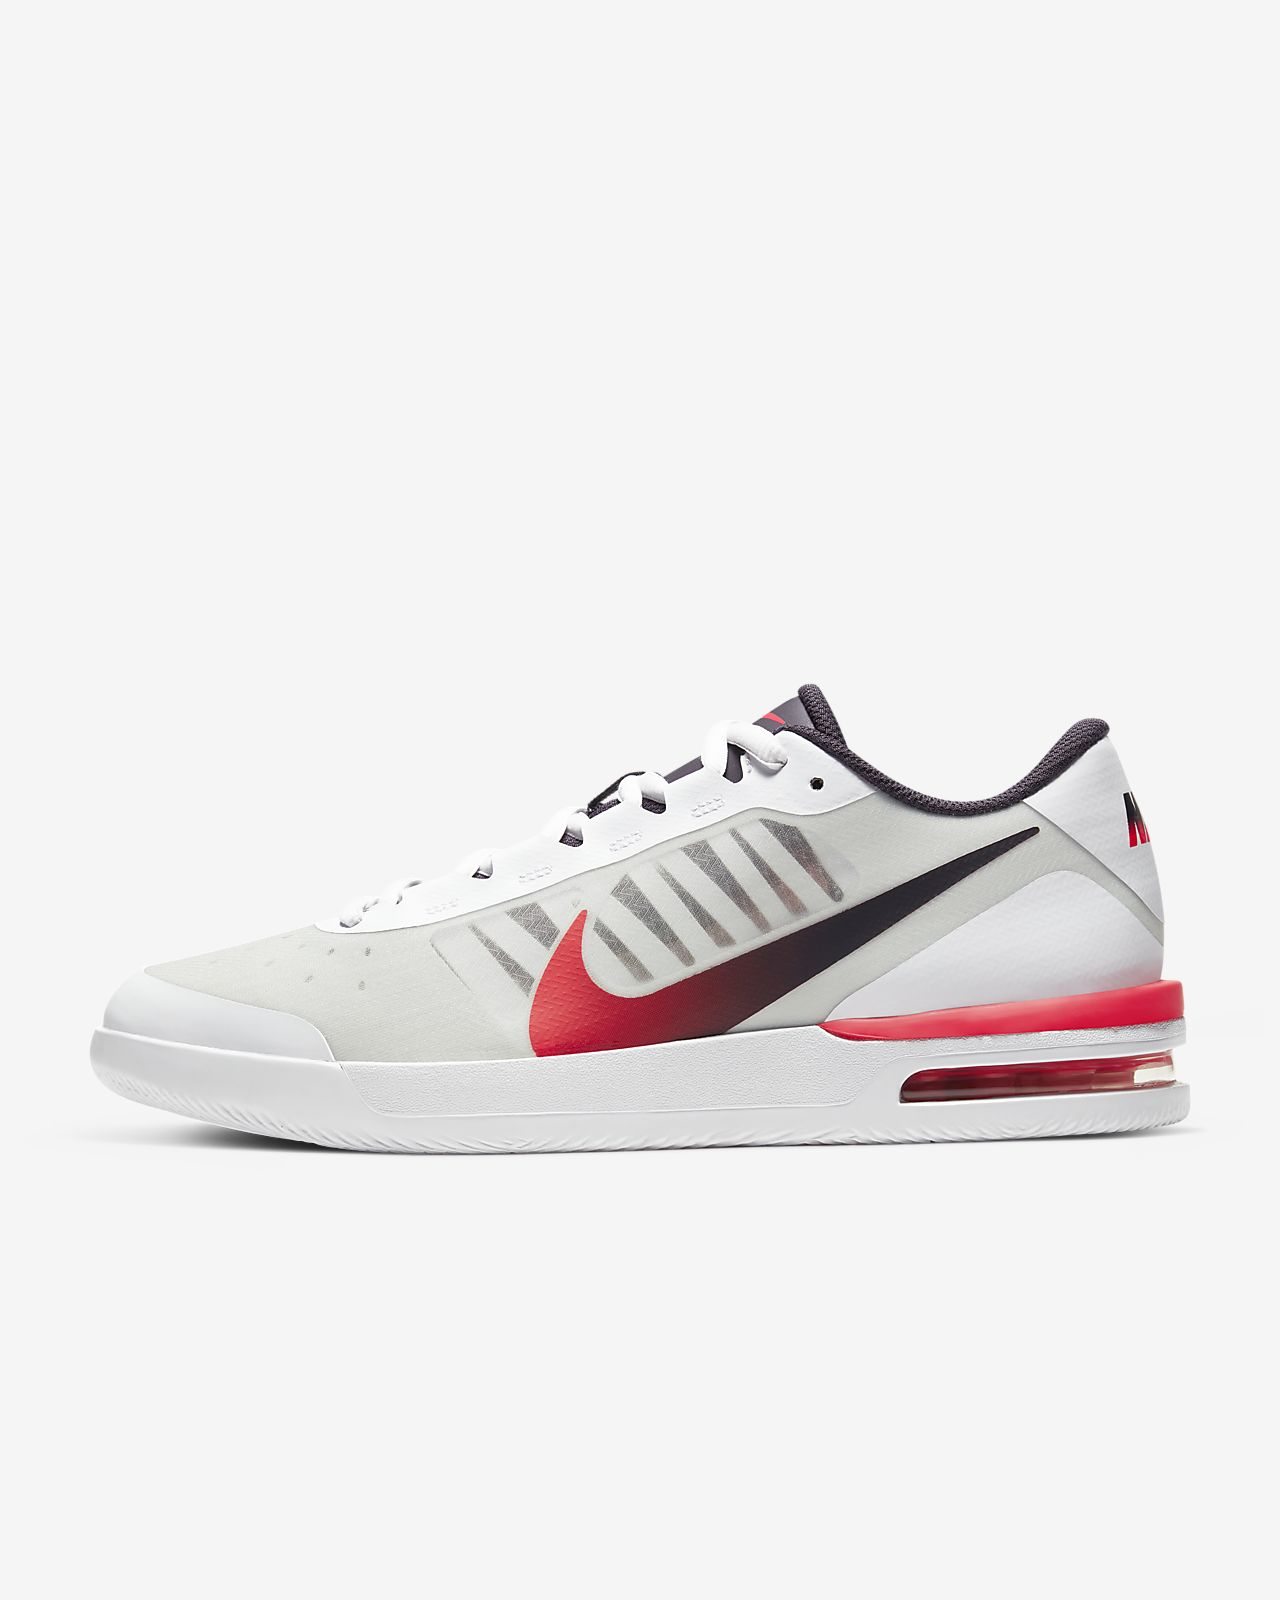 Nike Air Max Vapor Wing MS 男子多地面网球鞋